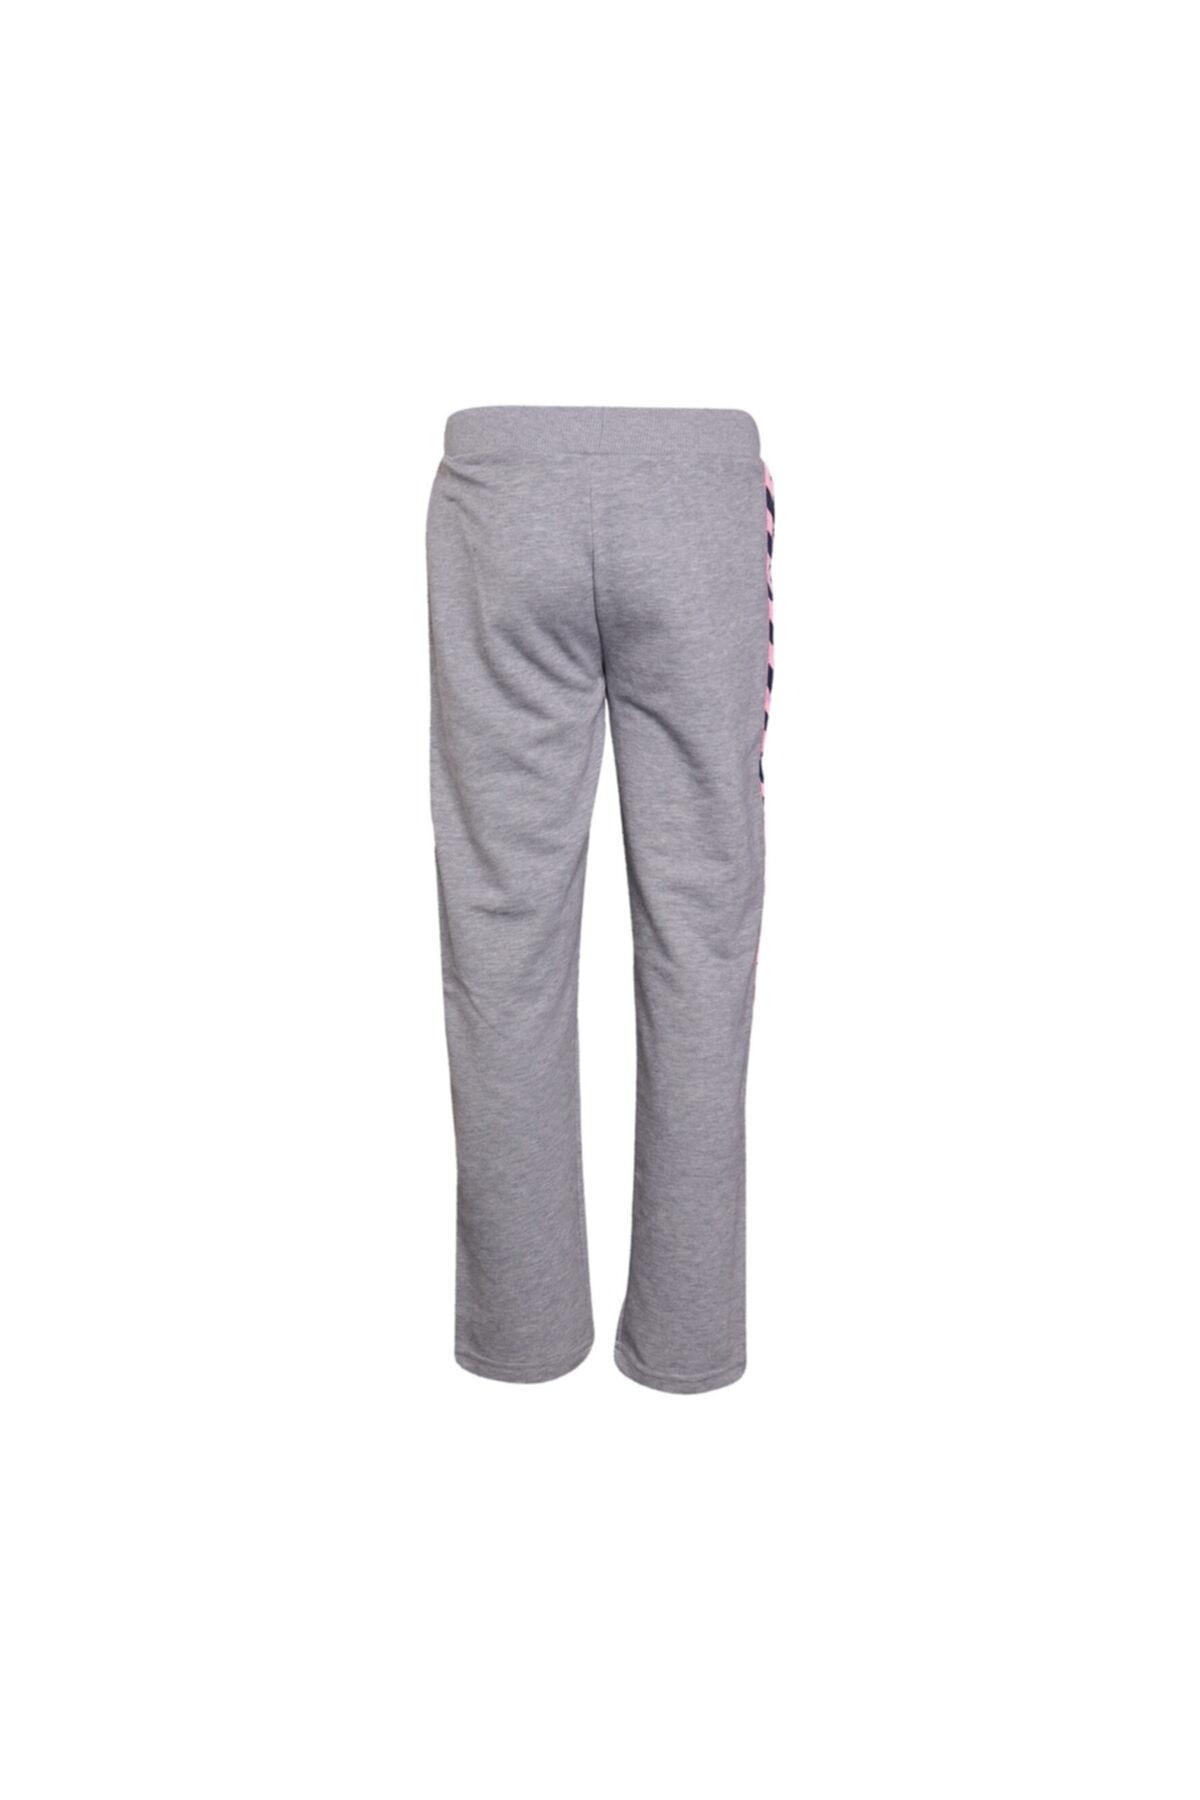 HUMMEL Jarıca Spor Pantolon 2